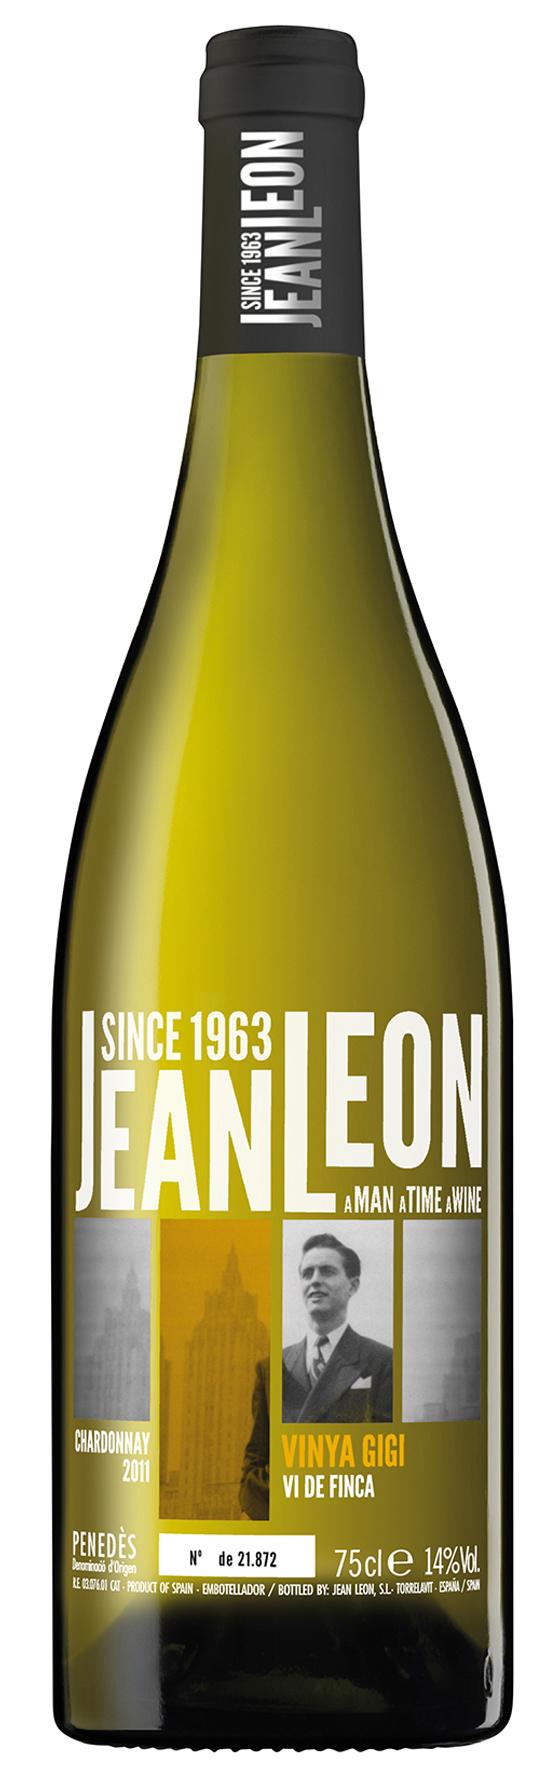 2015 Jean Leon - Vinya Gigi - Chardonnay